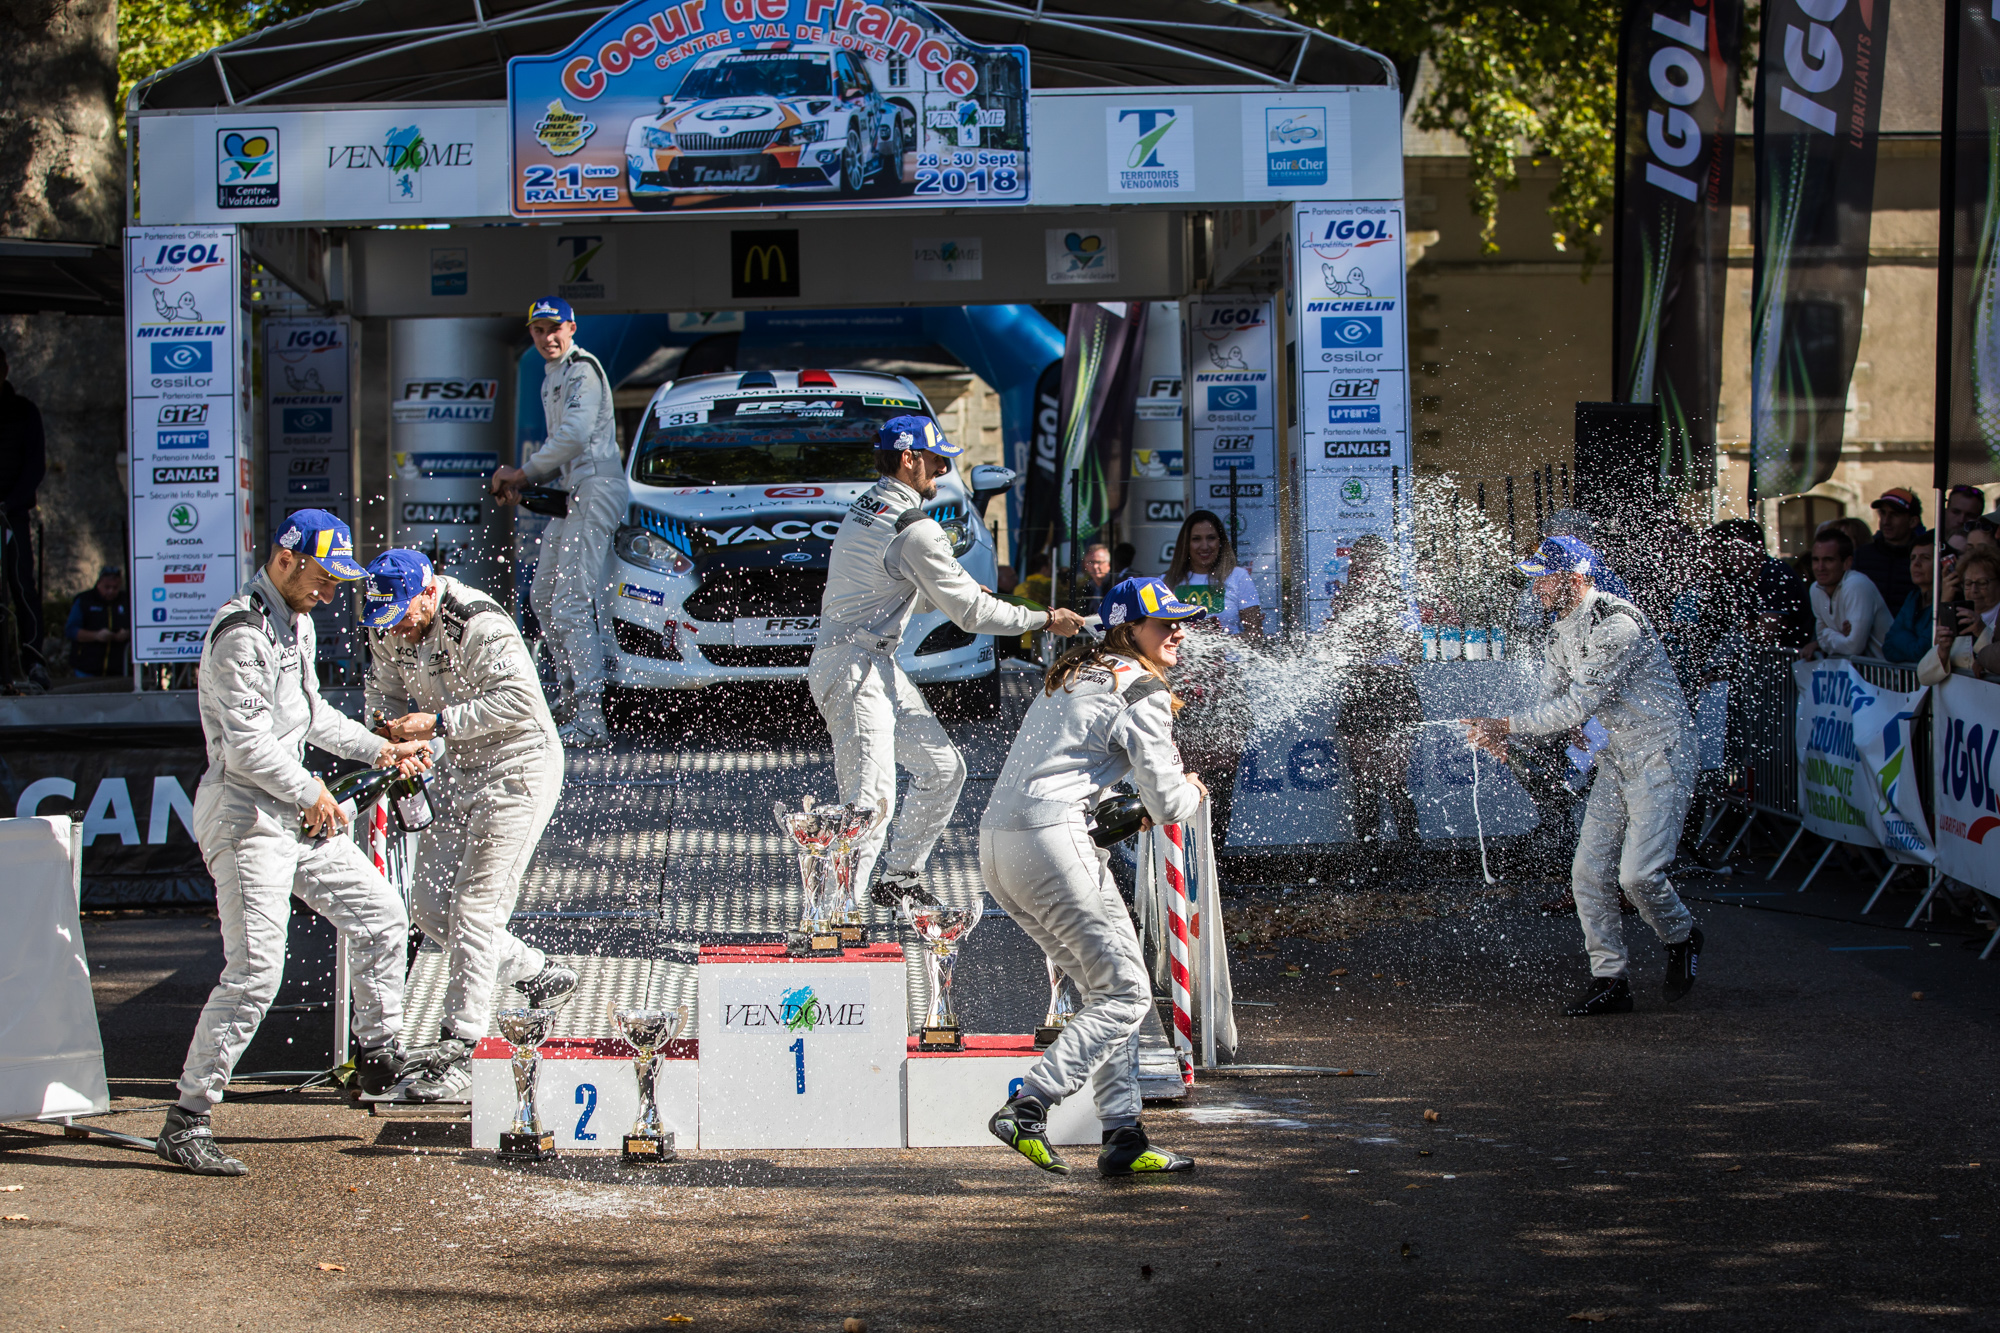 Mistrovství Francie - Rally juniorů 2018, Savigny-sur-Braye